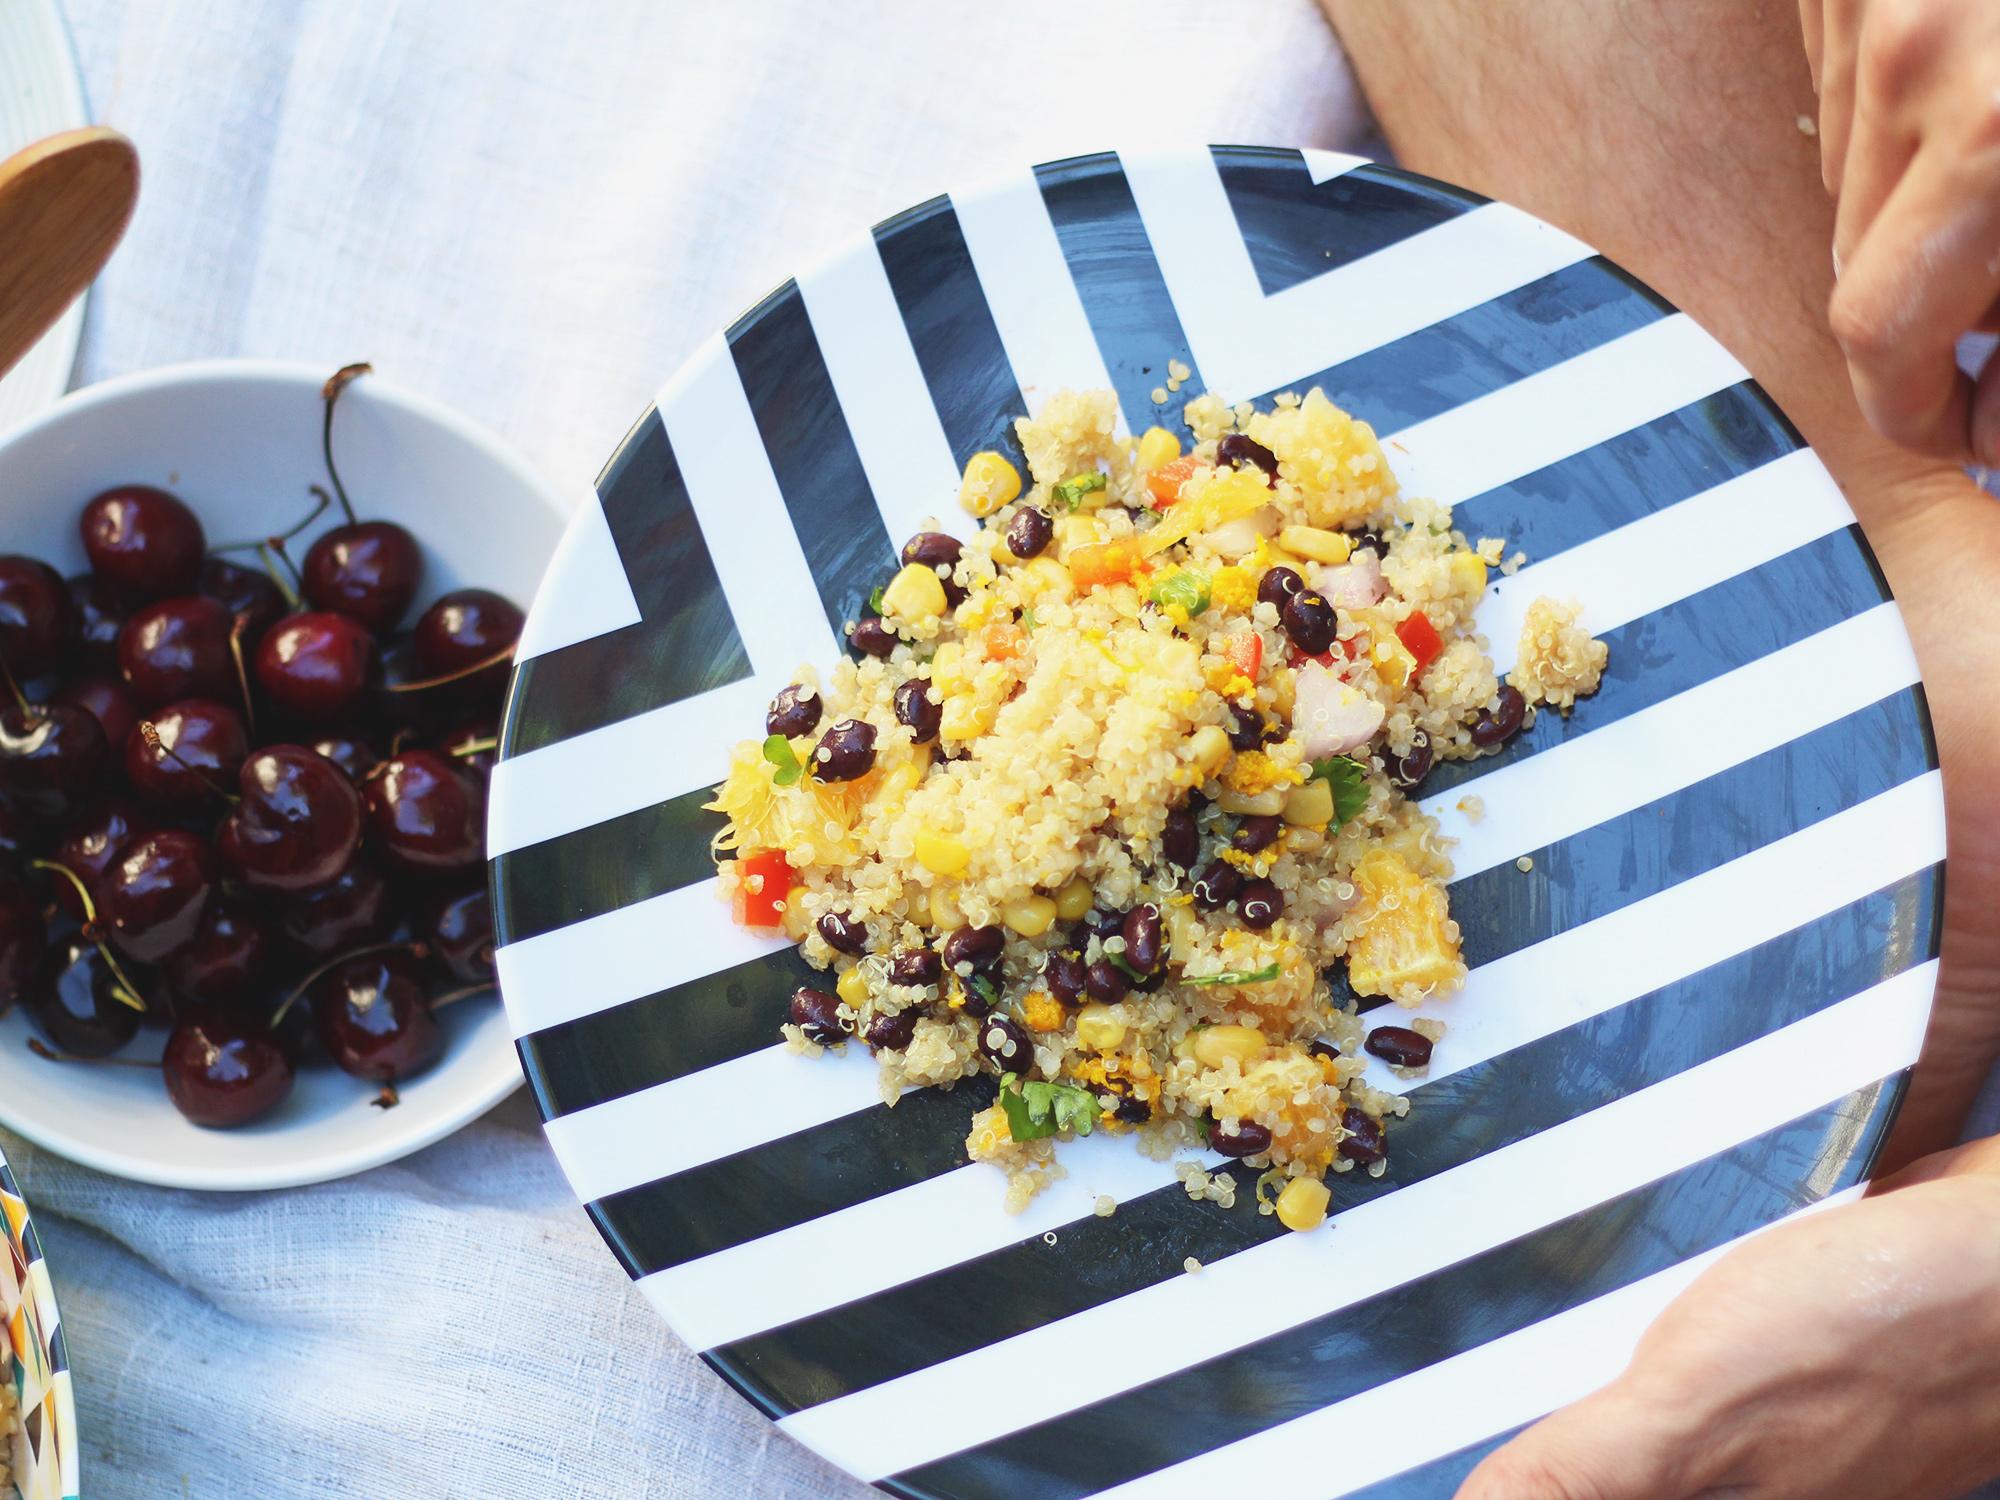 Delicious Black Bean & Quinoa Salad